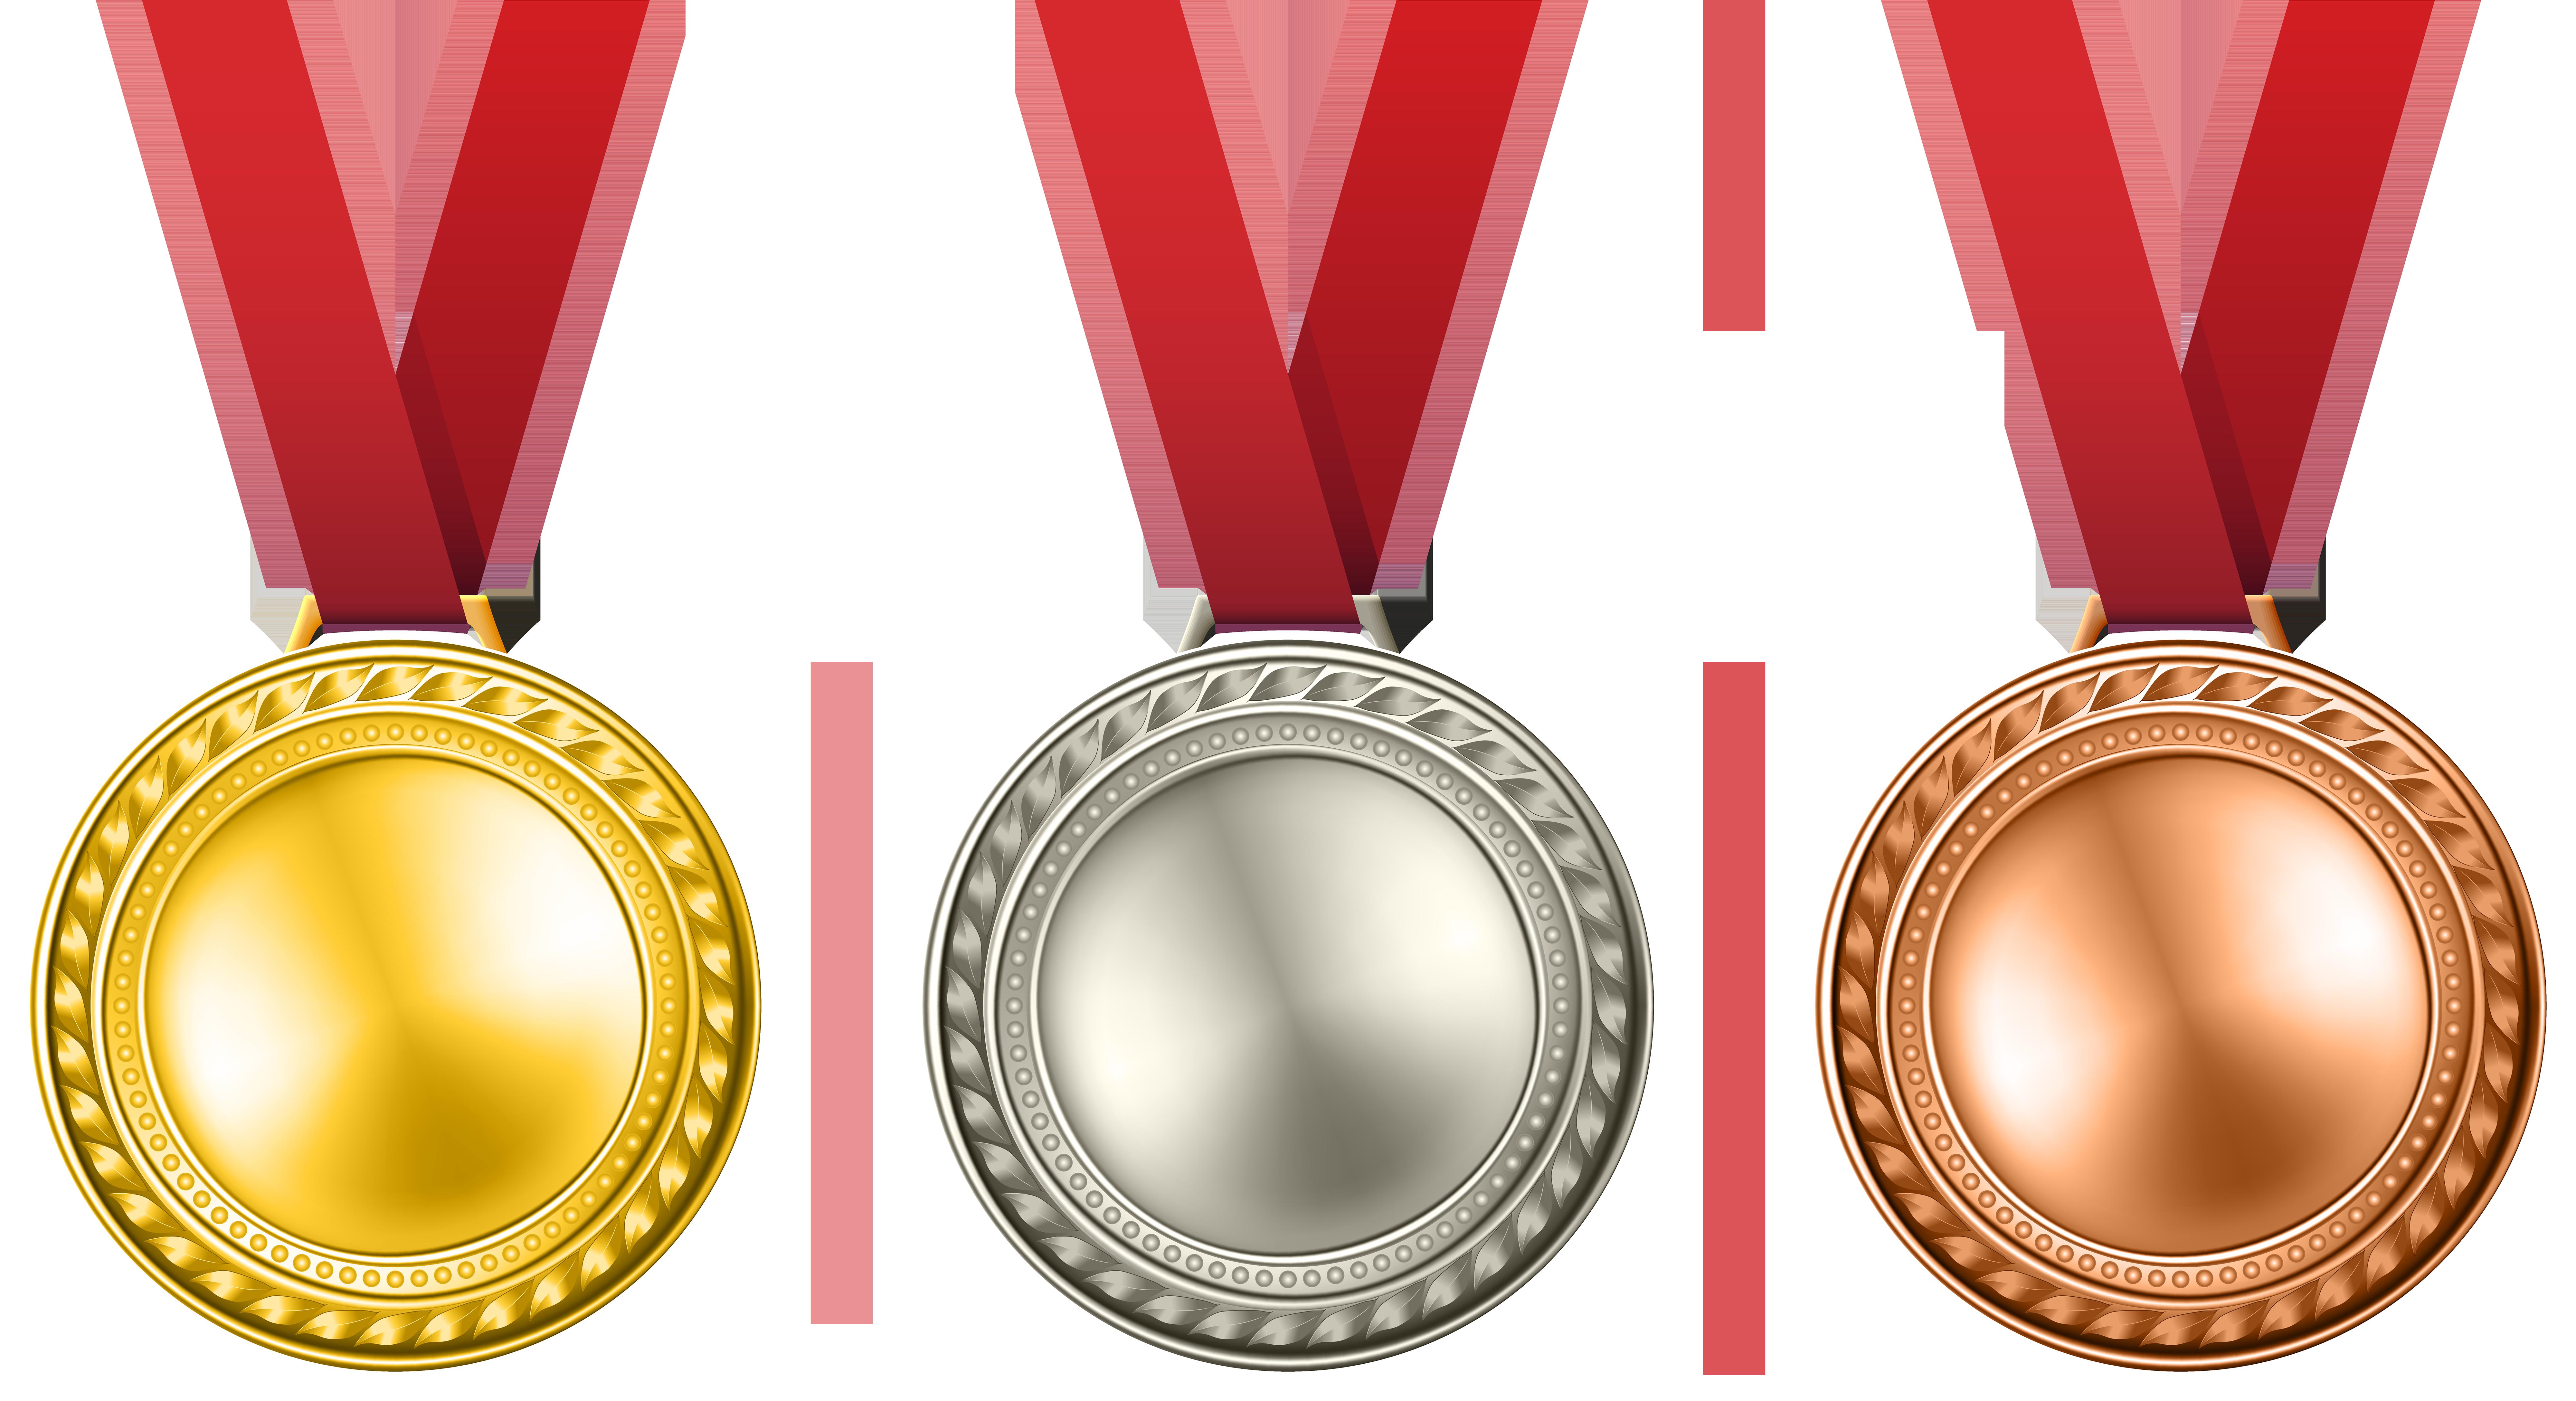 Awards clipart transparent background. Medals set png clip